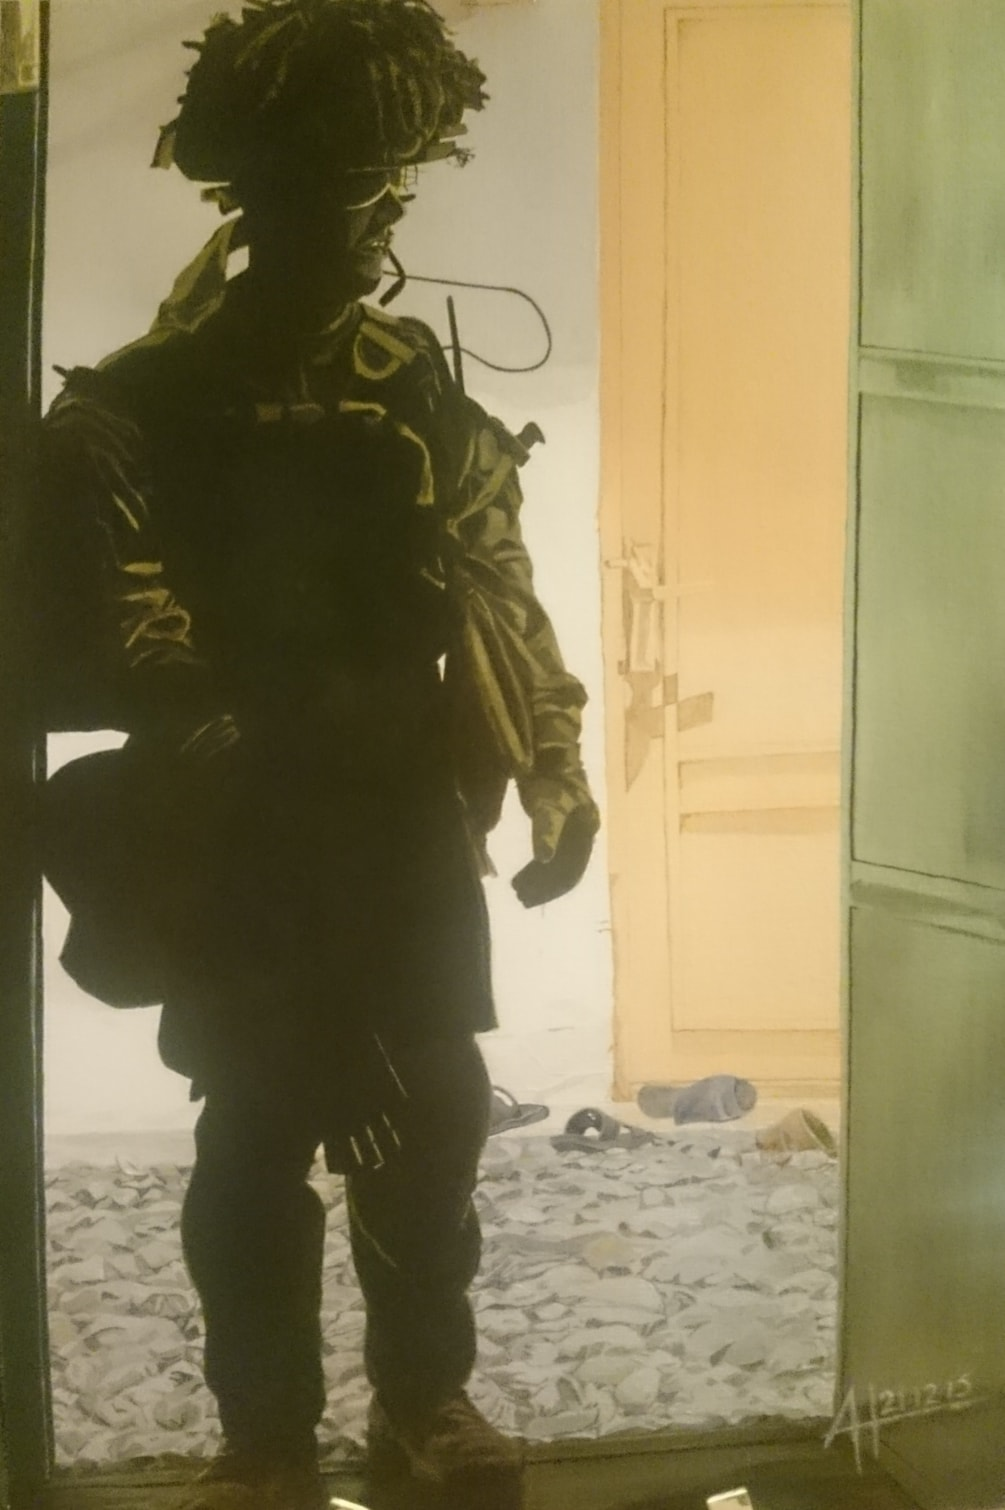 Gurkha Silhouetted in doorway.